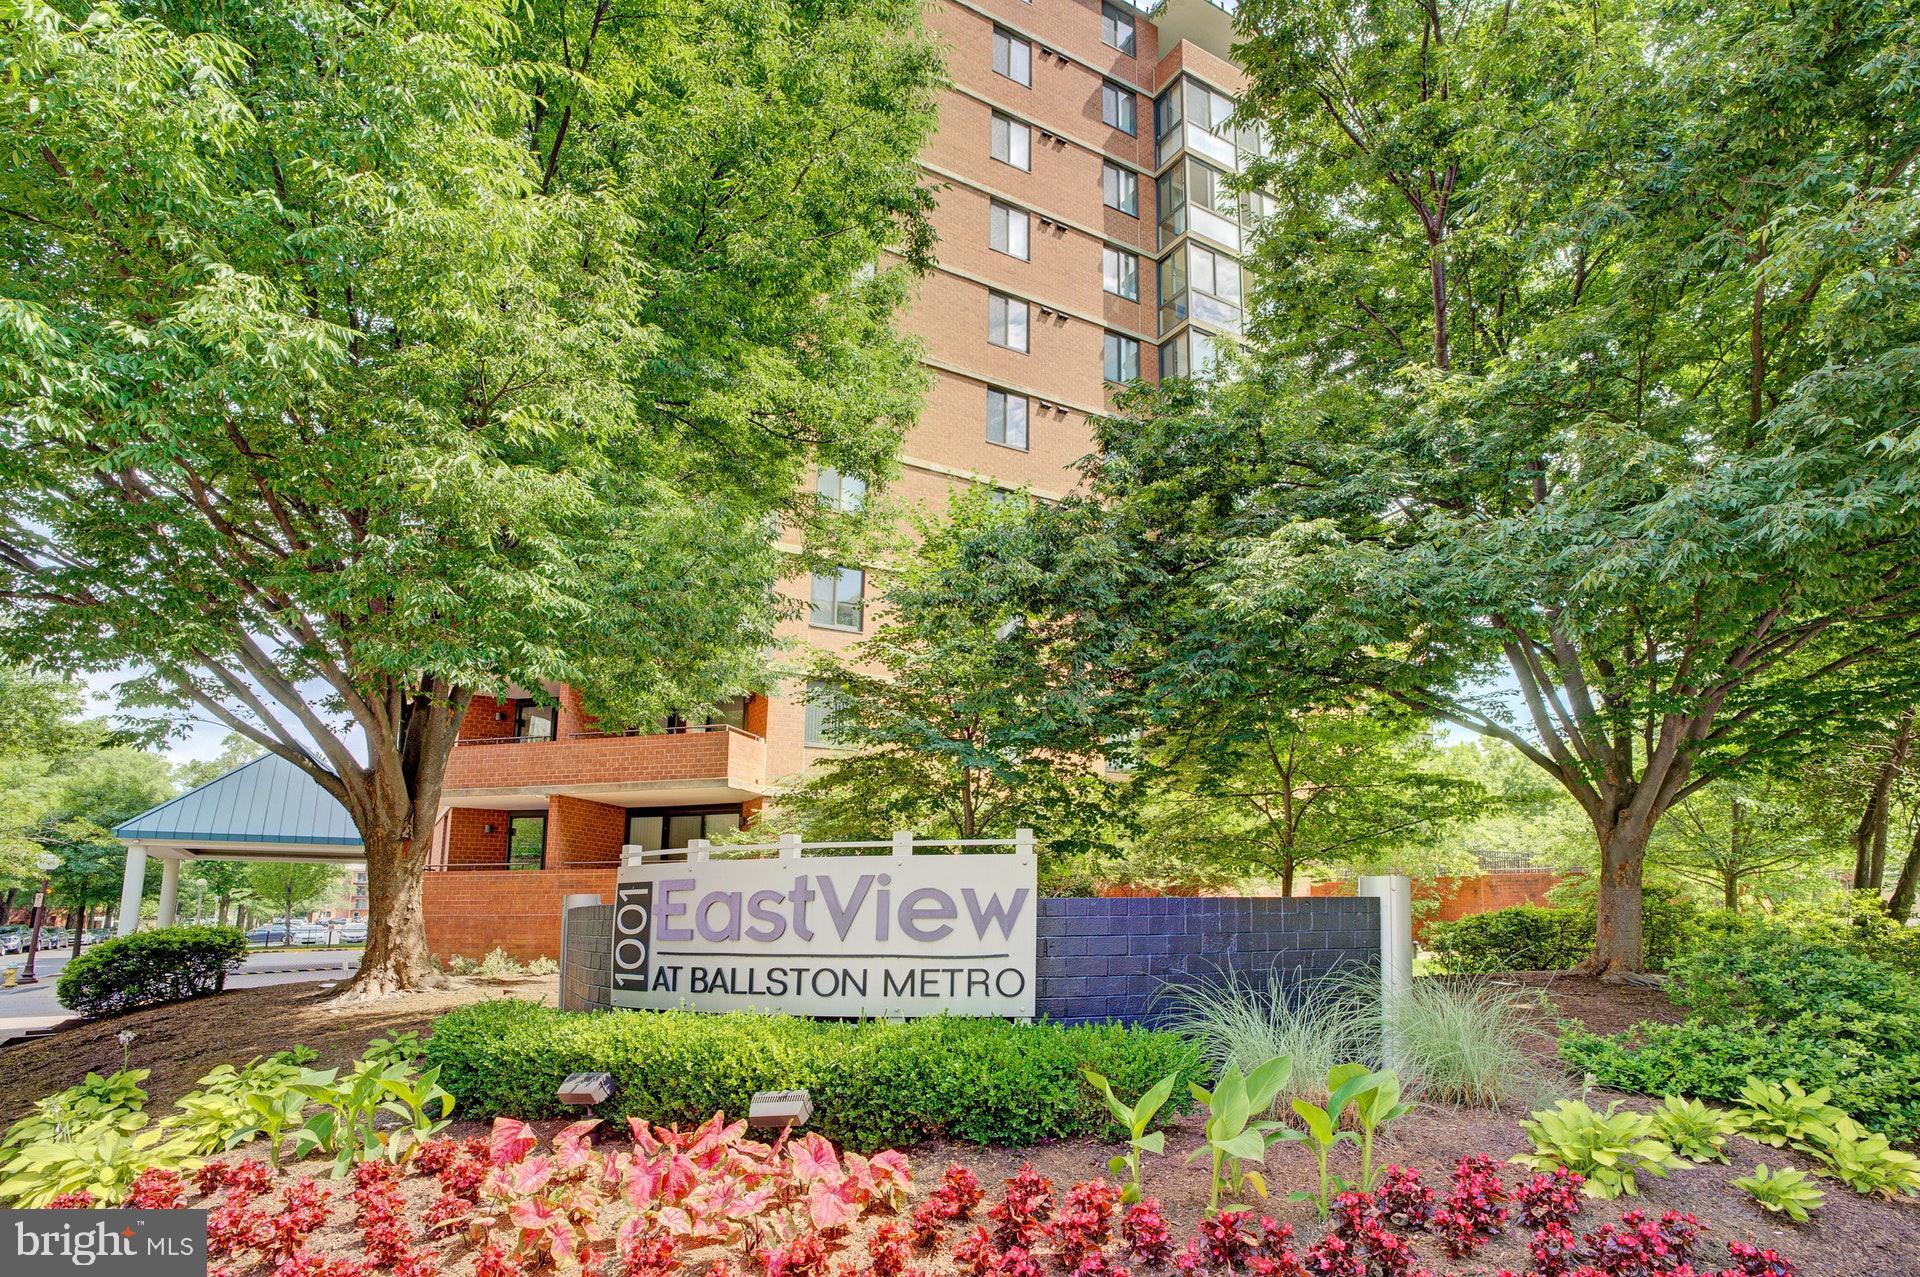 Arlington VA Homes For Sale, $450,000-$550,000